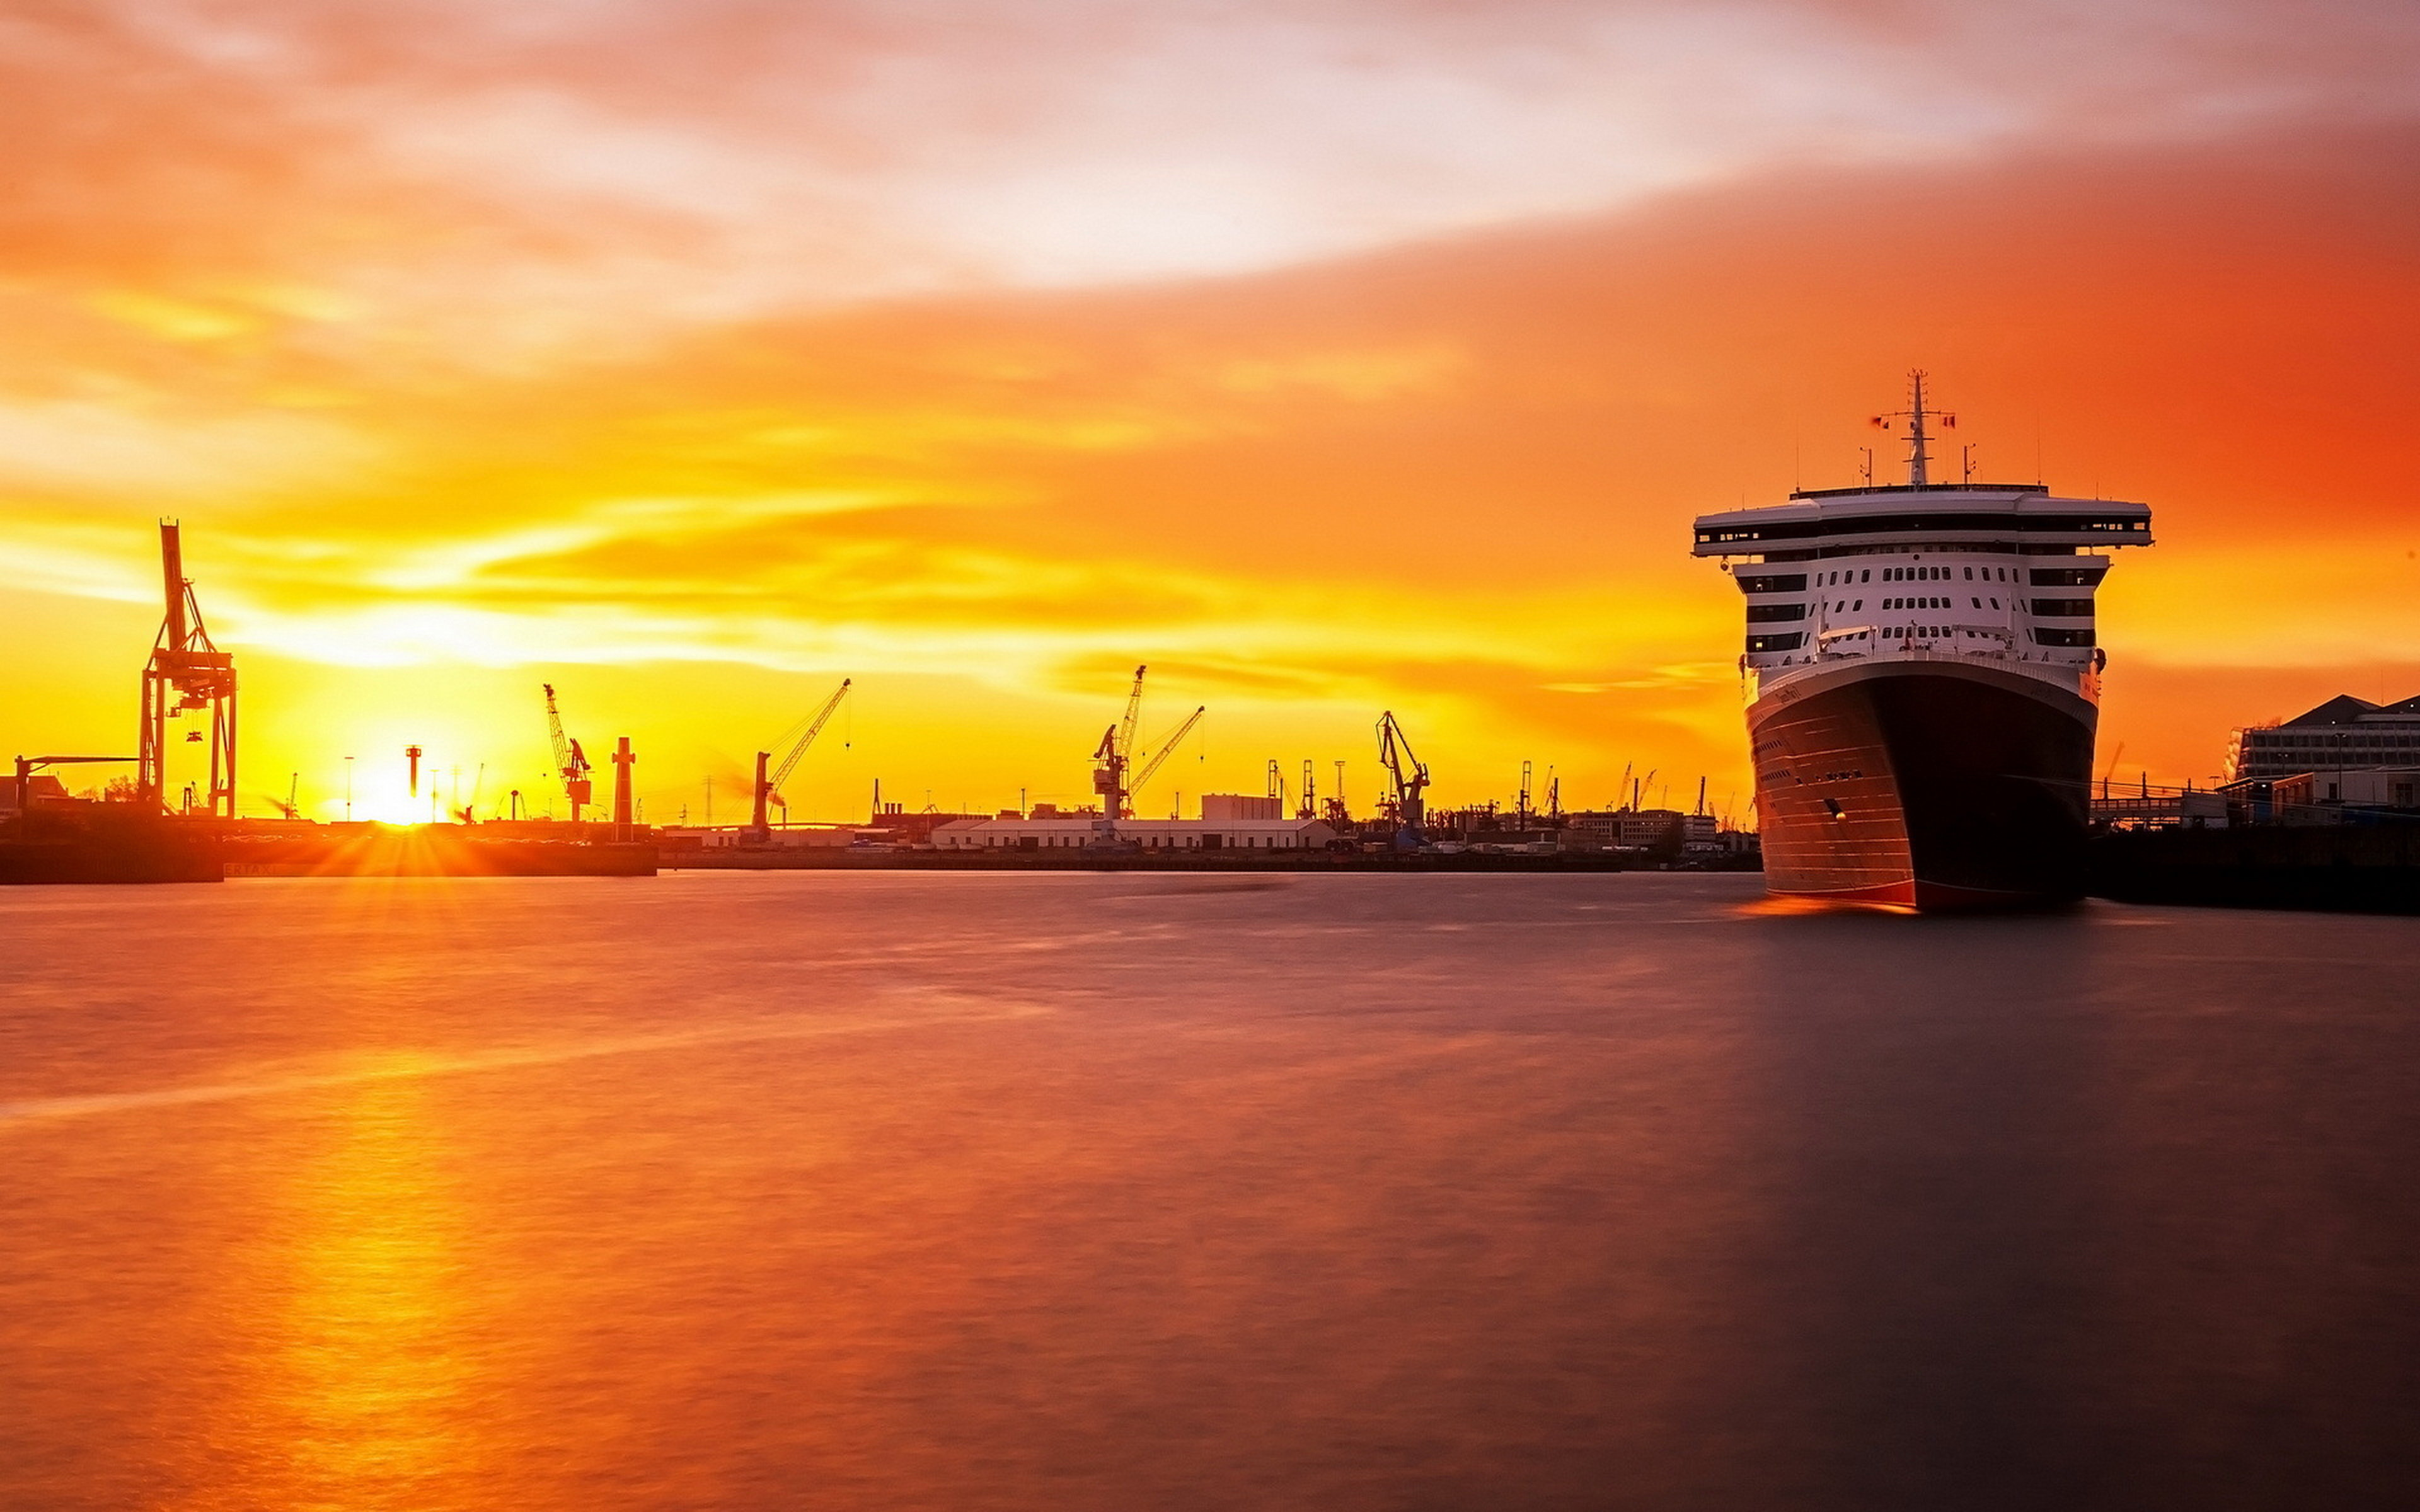 Free Download Cruise Ship Wallpaper Id 493473 Hd 3840x2400 For Desktop